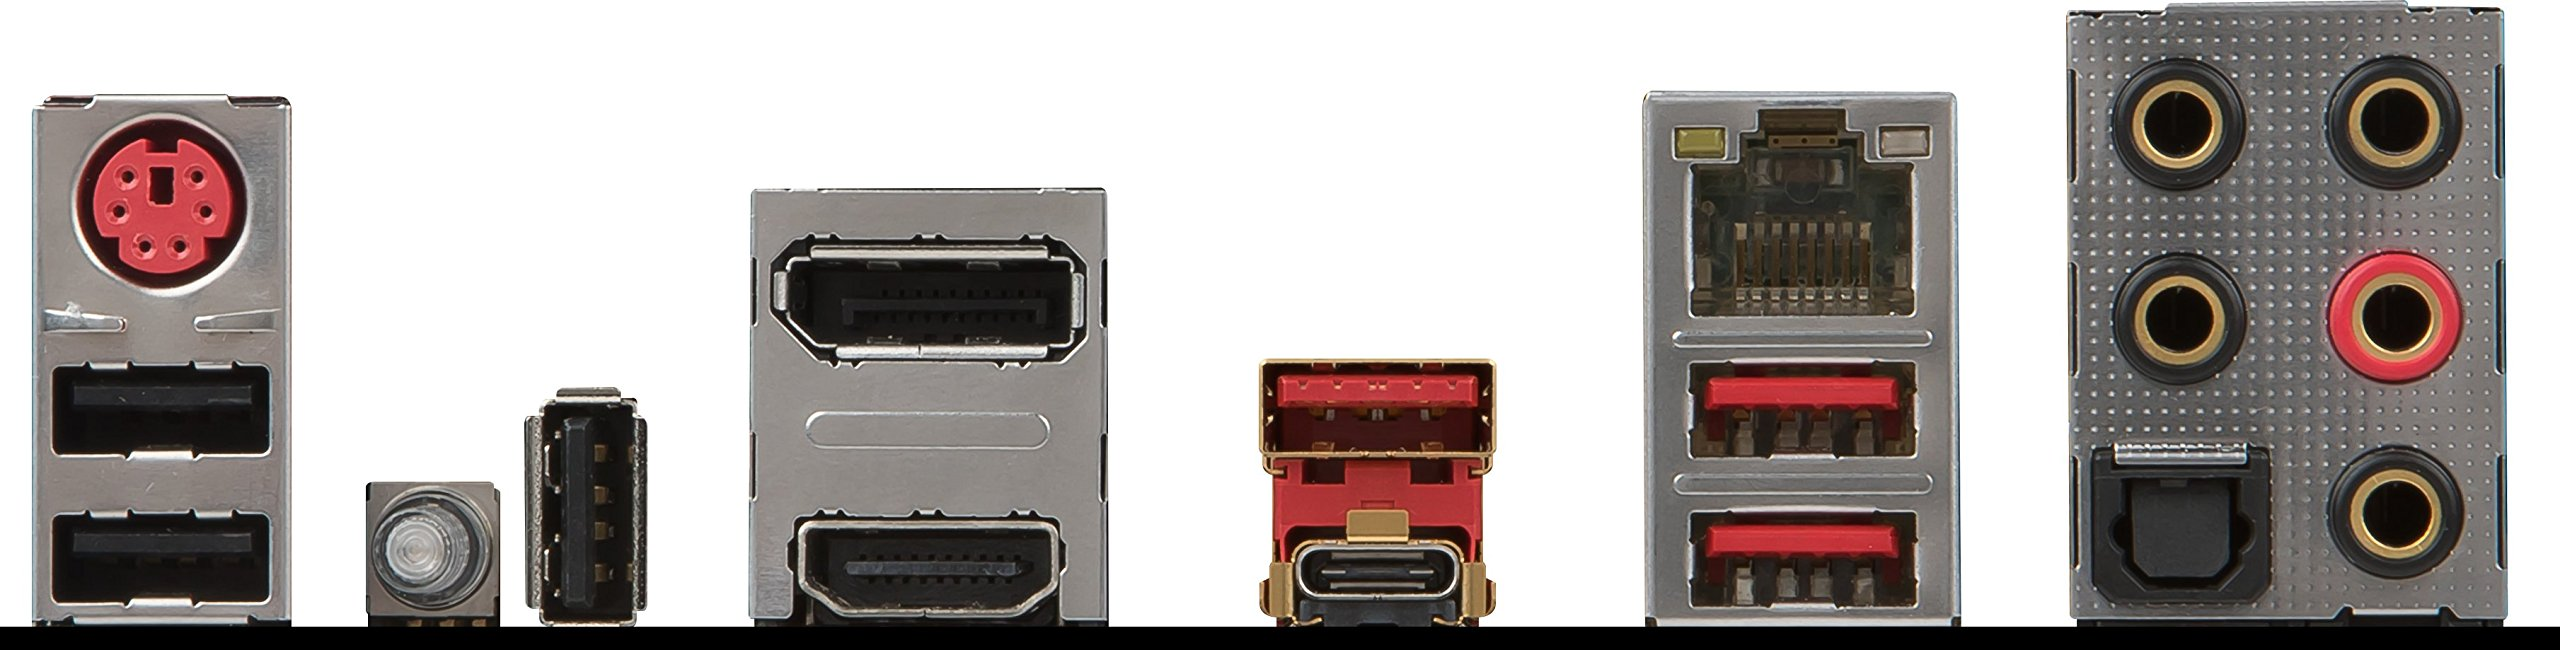 MSI Enthusiastic Gaming Intel Kaby Lake Z270 DDR4 VR Ready HDMI USB 3 ATX Motherboard (Z270 GAMING M6 AC)